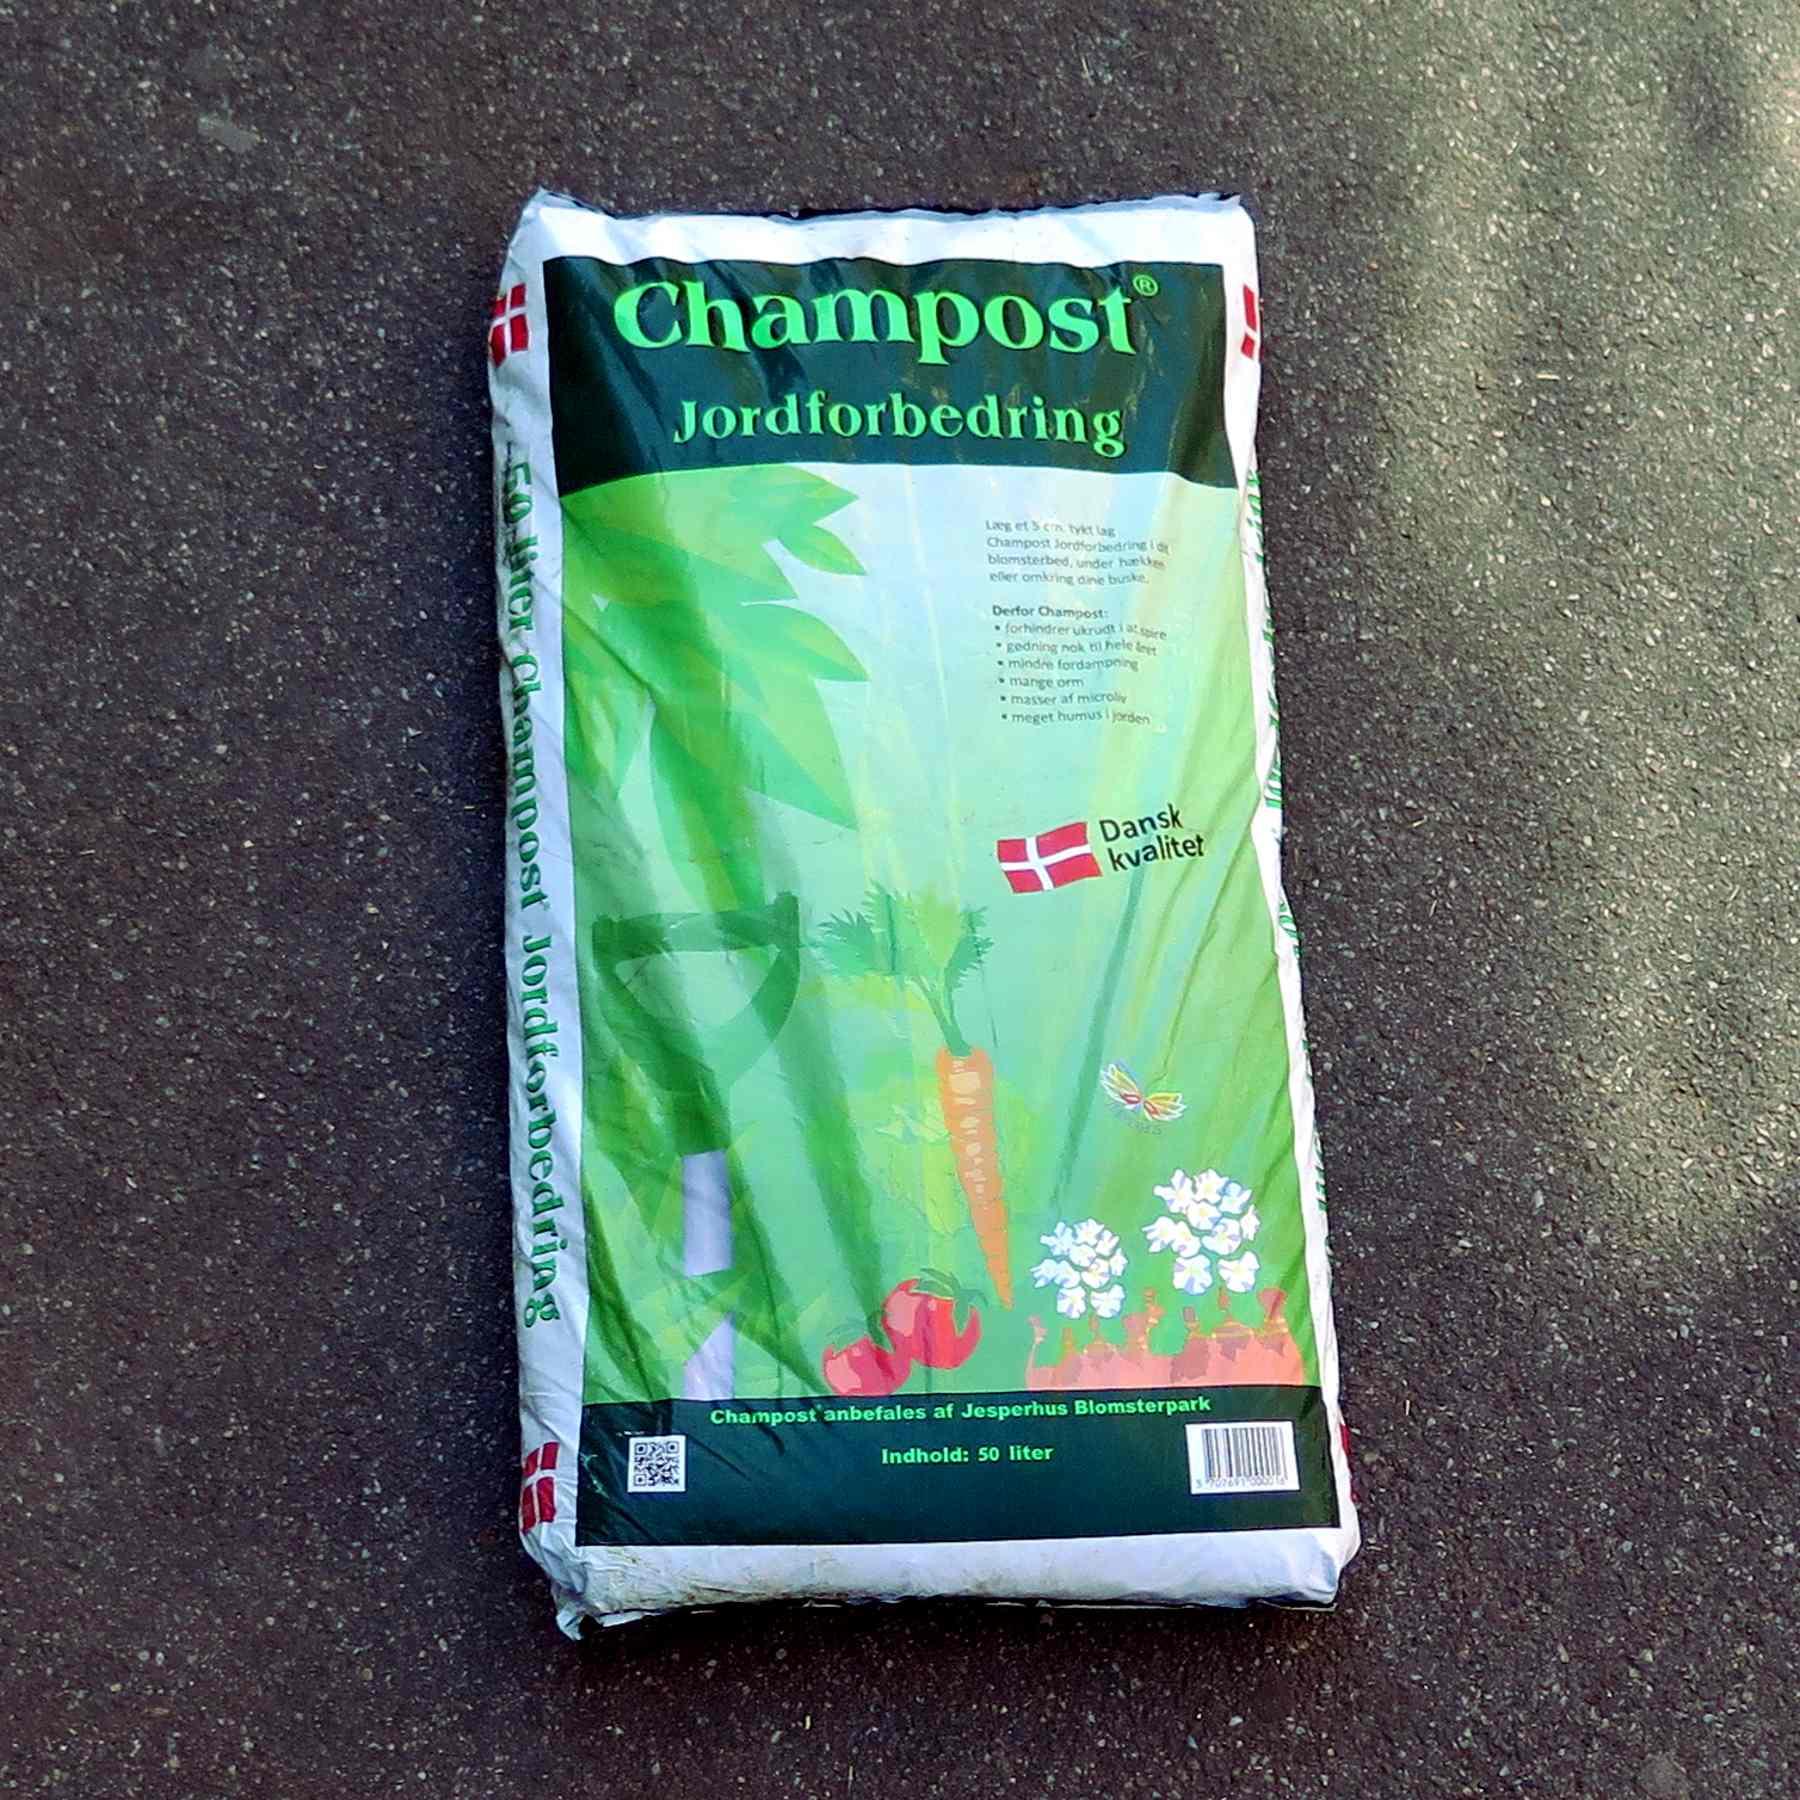 Champost jordforbedring bigbag